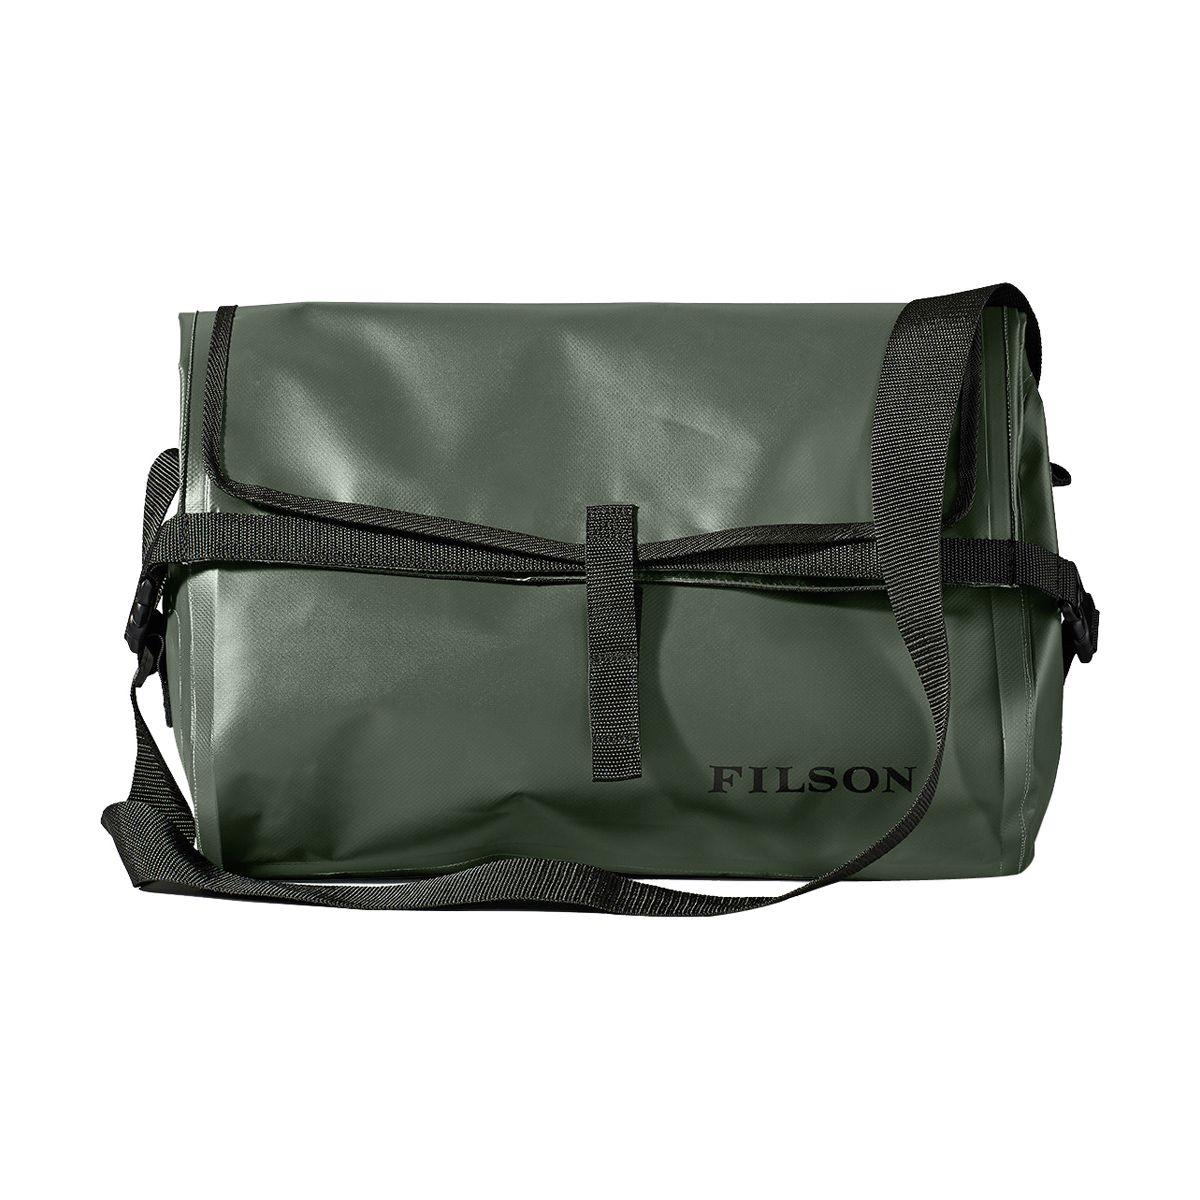 photo of a Filson waterproof storage bag